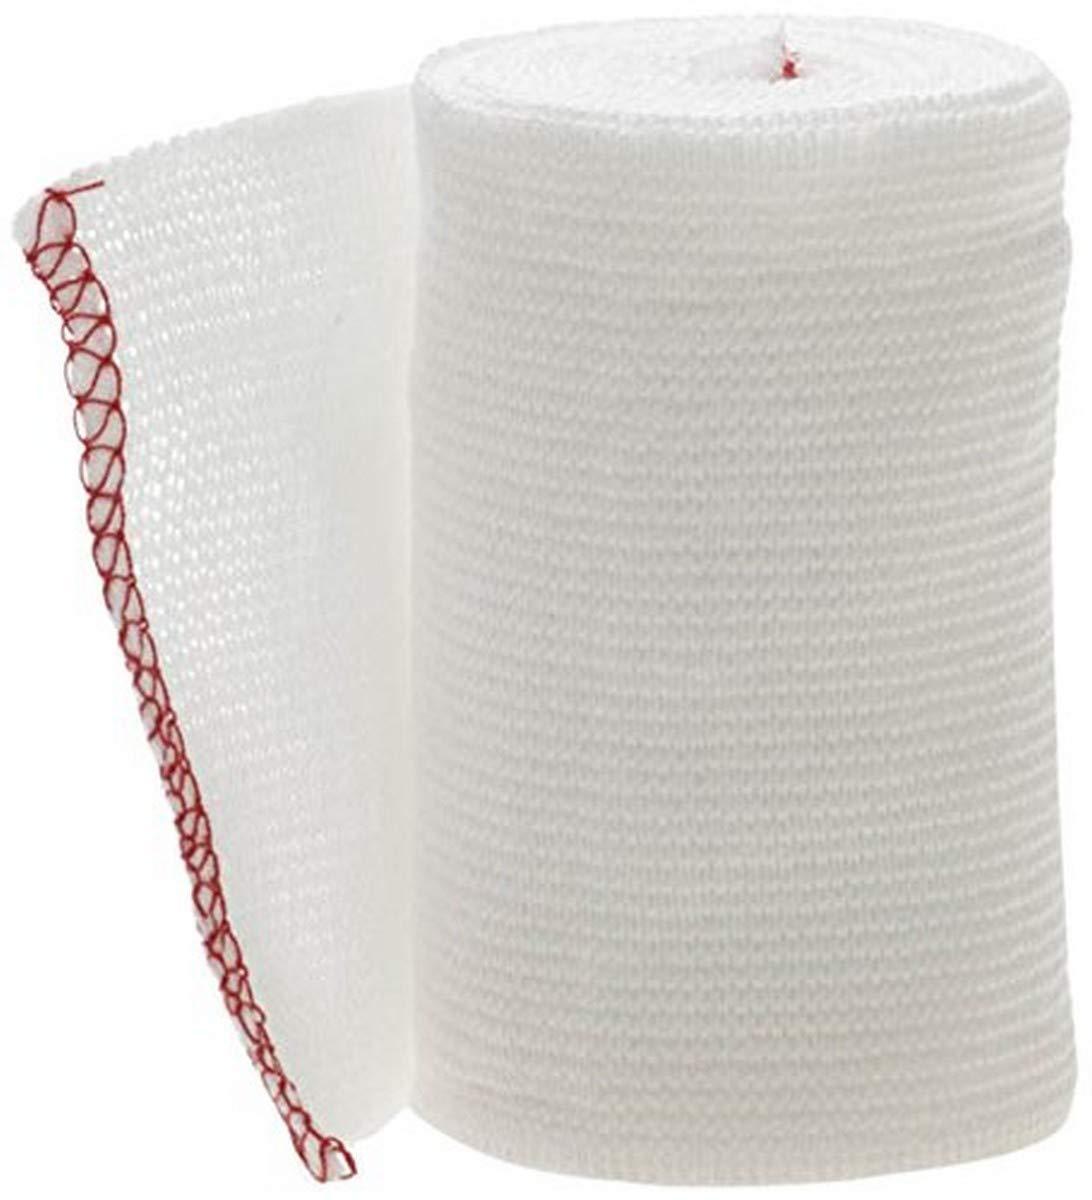 "Medline MDS077003Z Swift-Wrap Elastic Bandages, Latex Free, Non Sterile, 3"" x 5 yard, White (Pack of 20) : Health & Household"